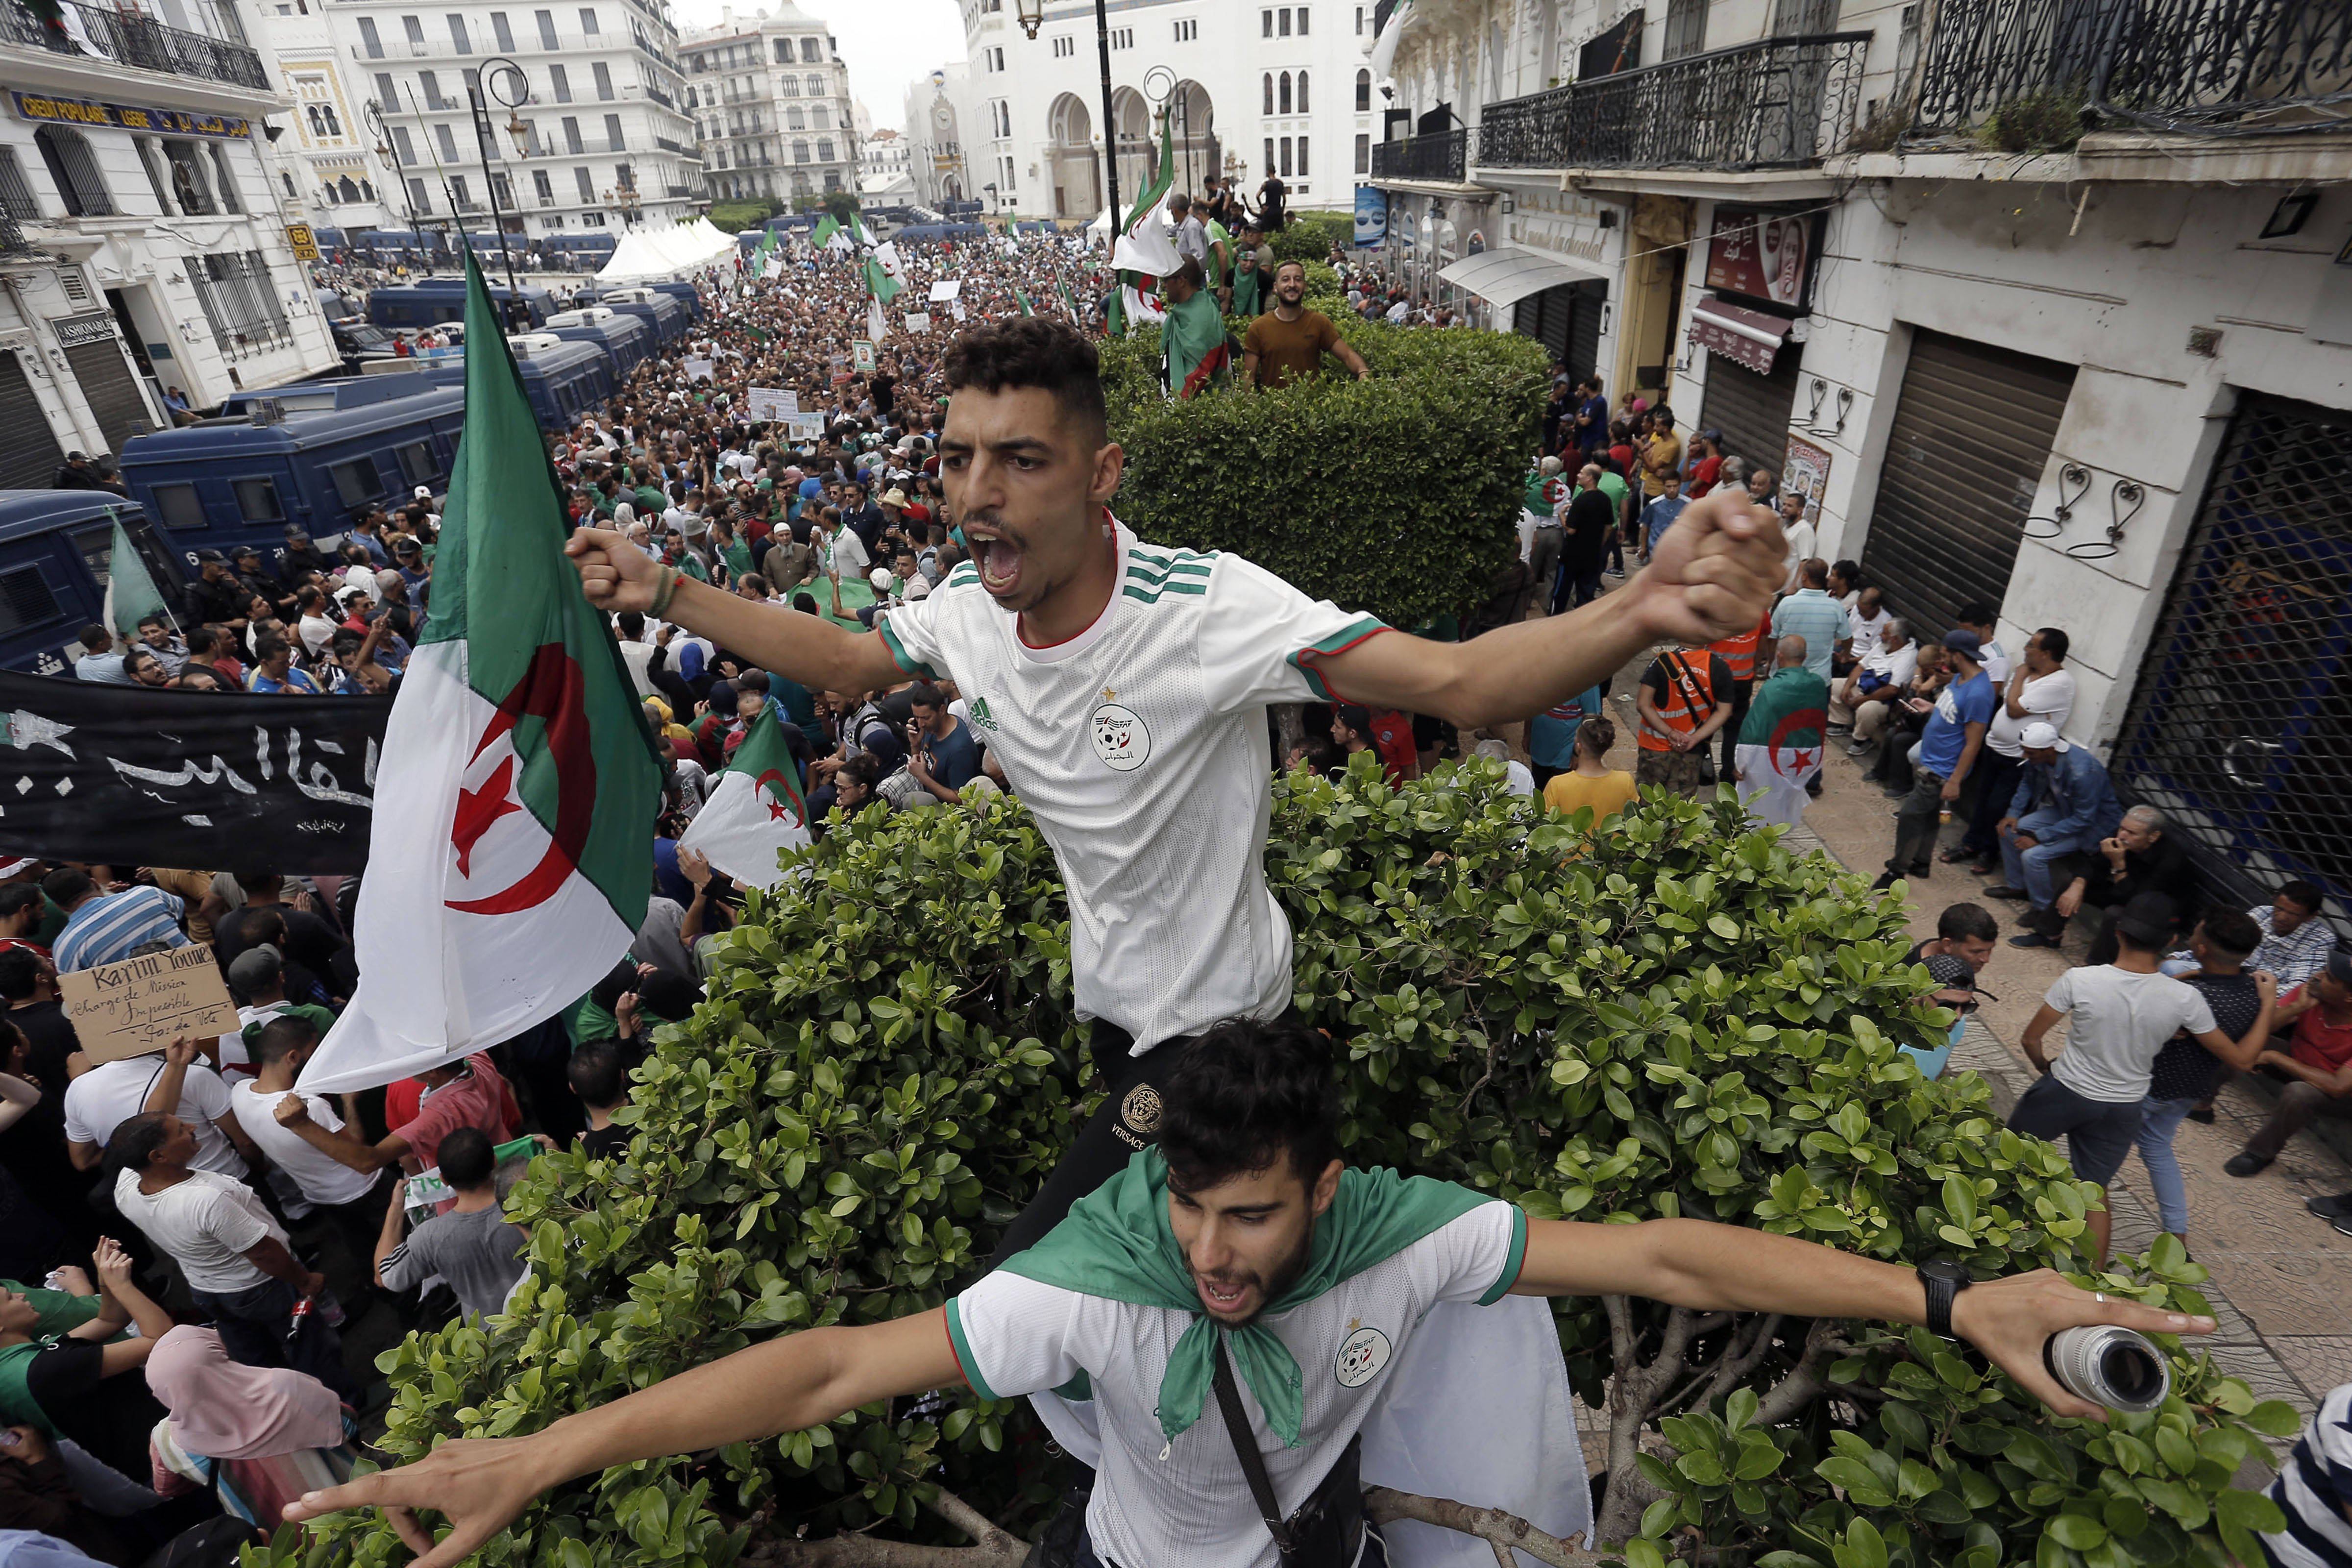 Des manifestants dans les rues d'Alger, vendredi 13 septembre 2019 (image d'illustration).